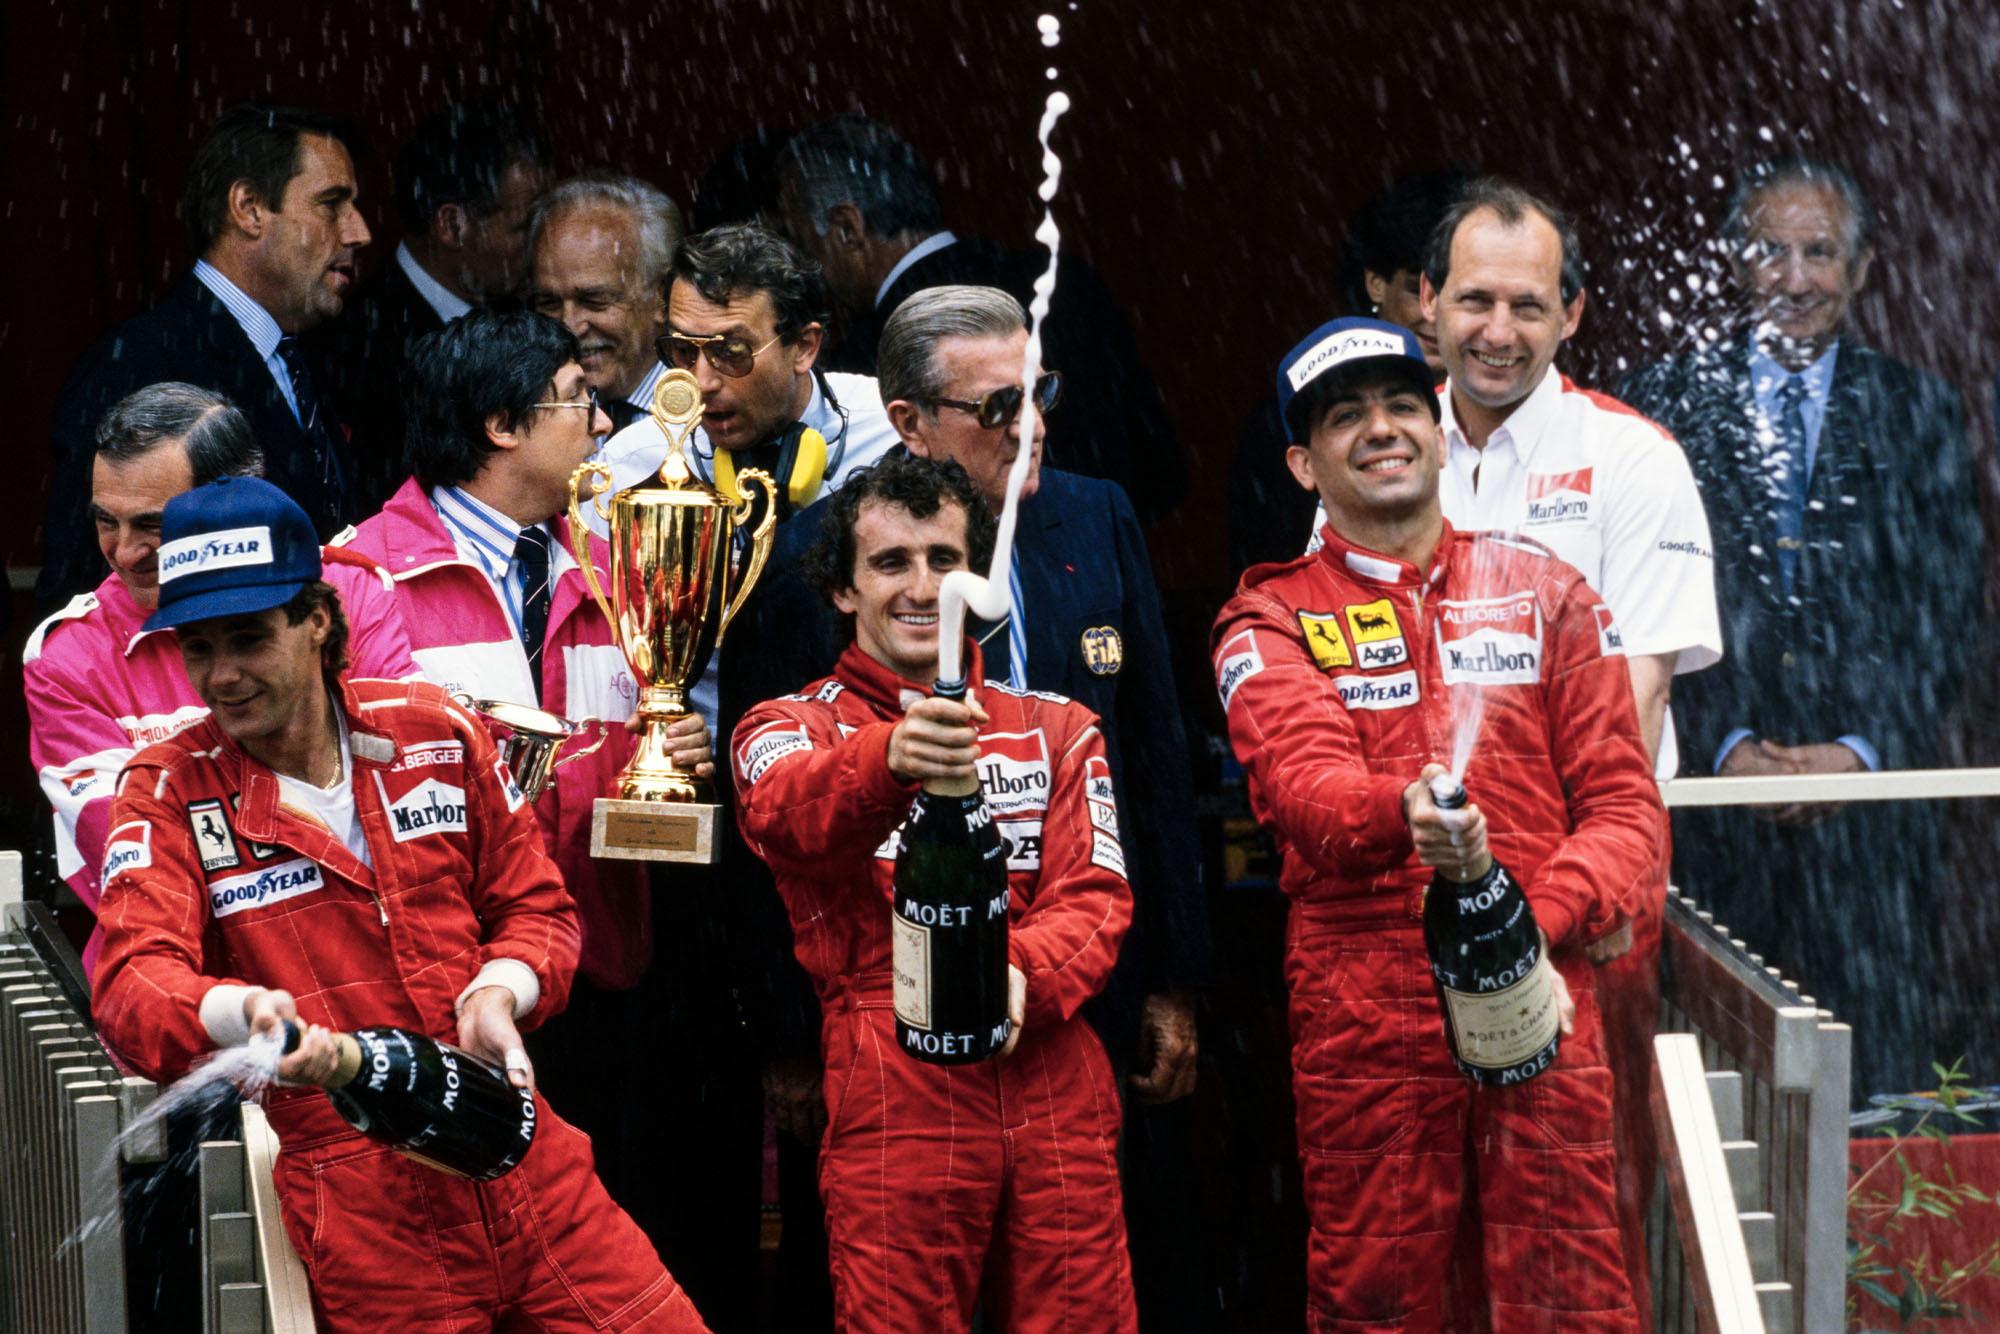 1988 MON GP podium